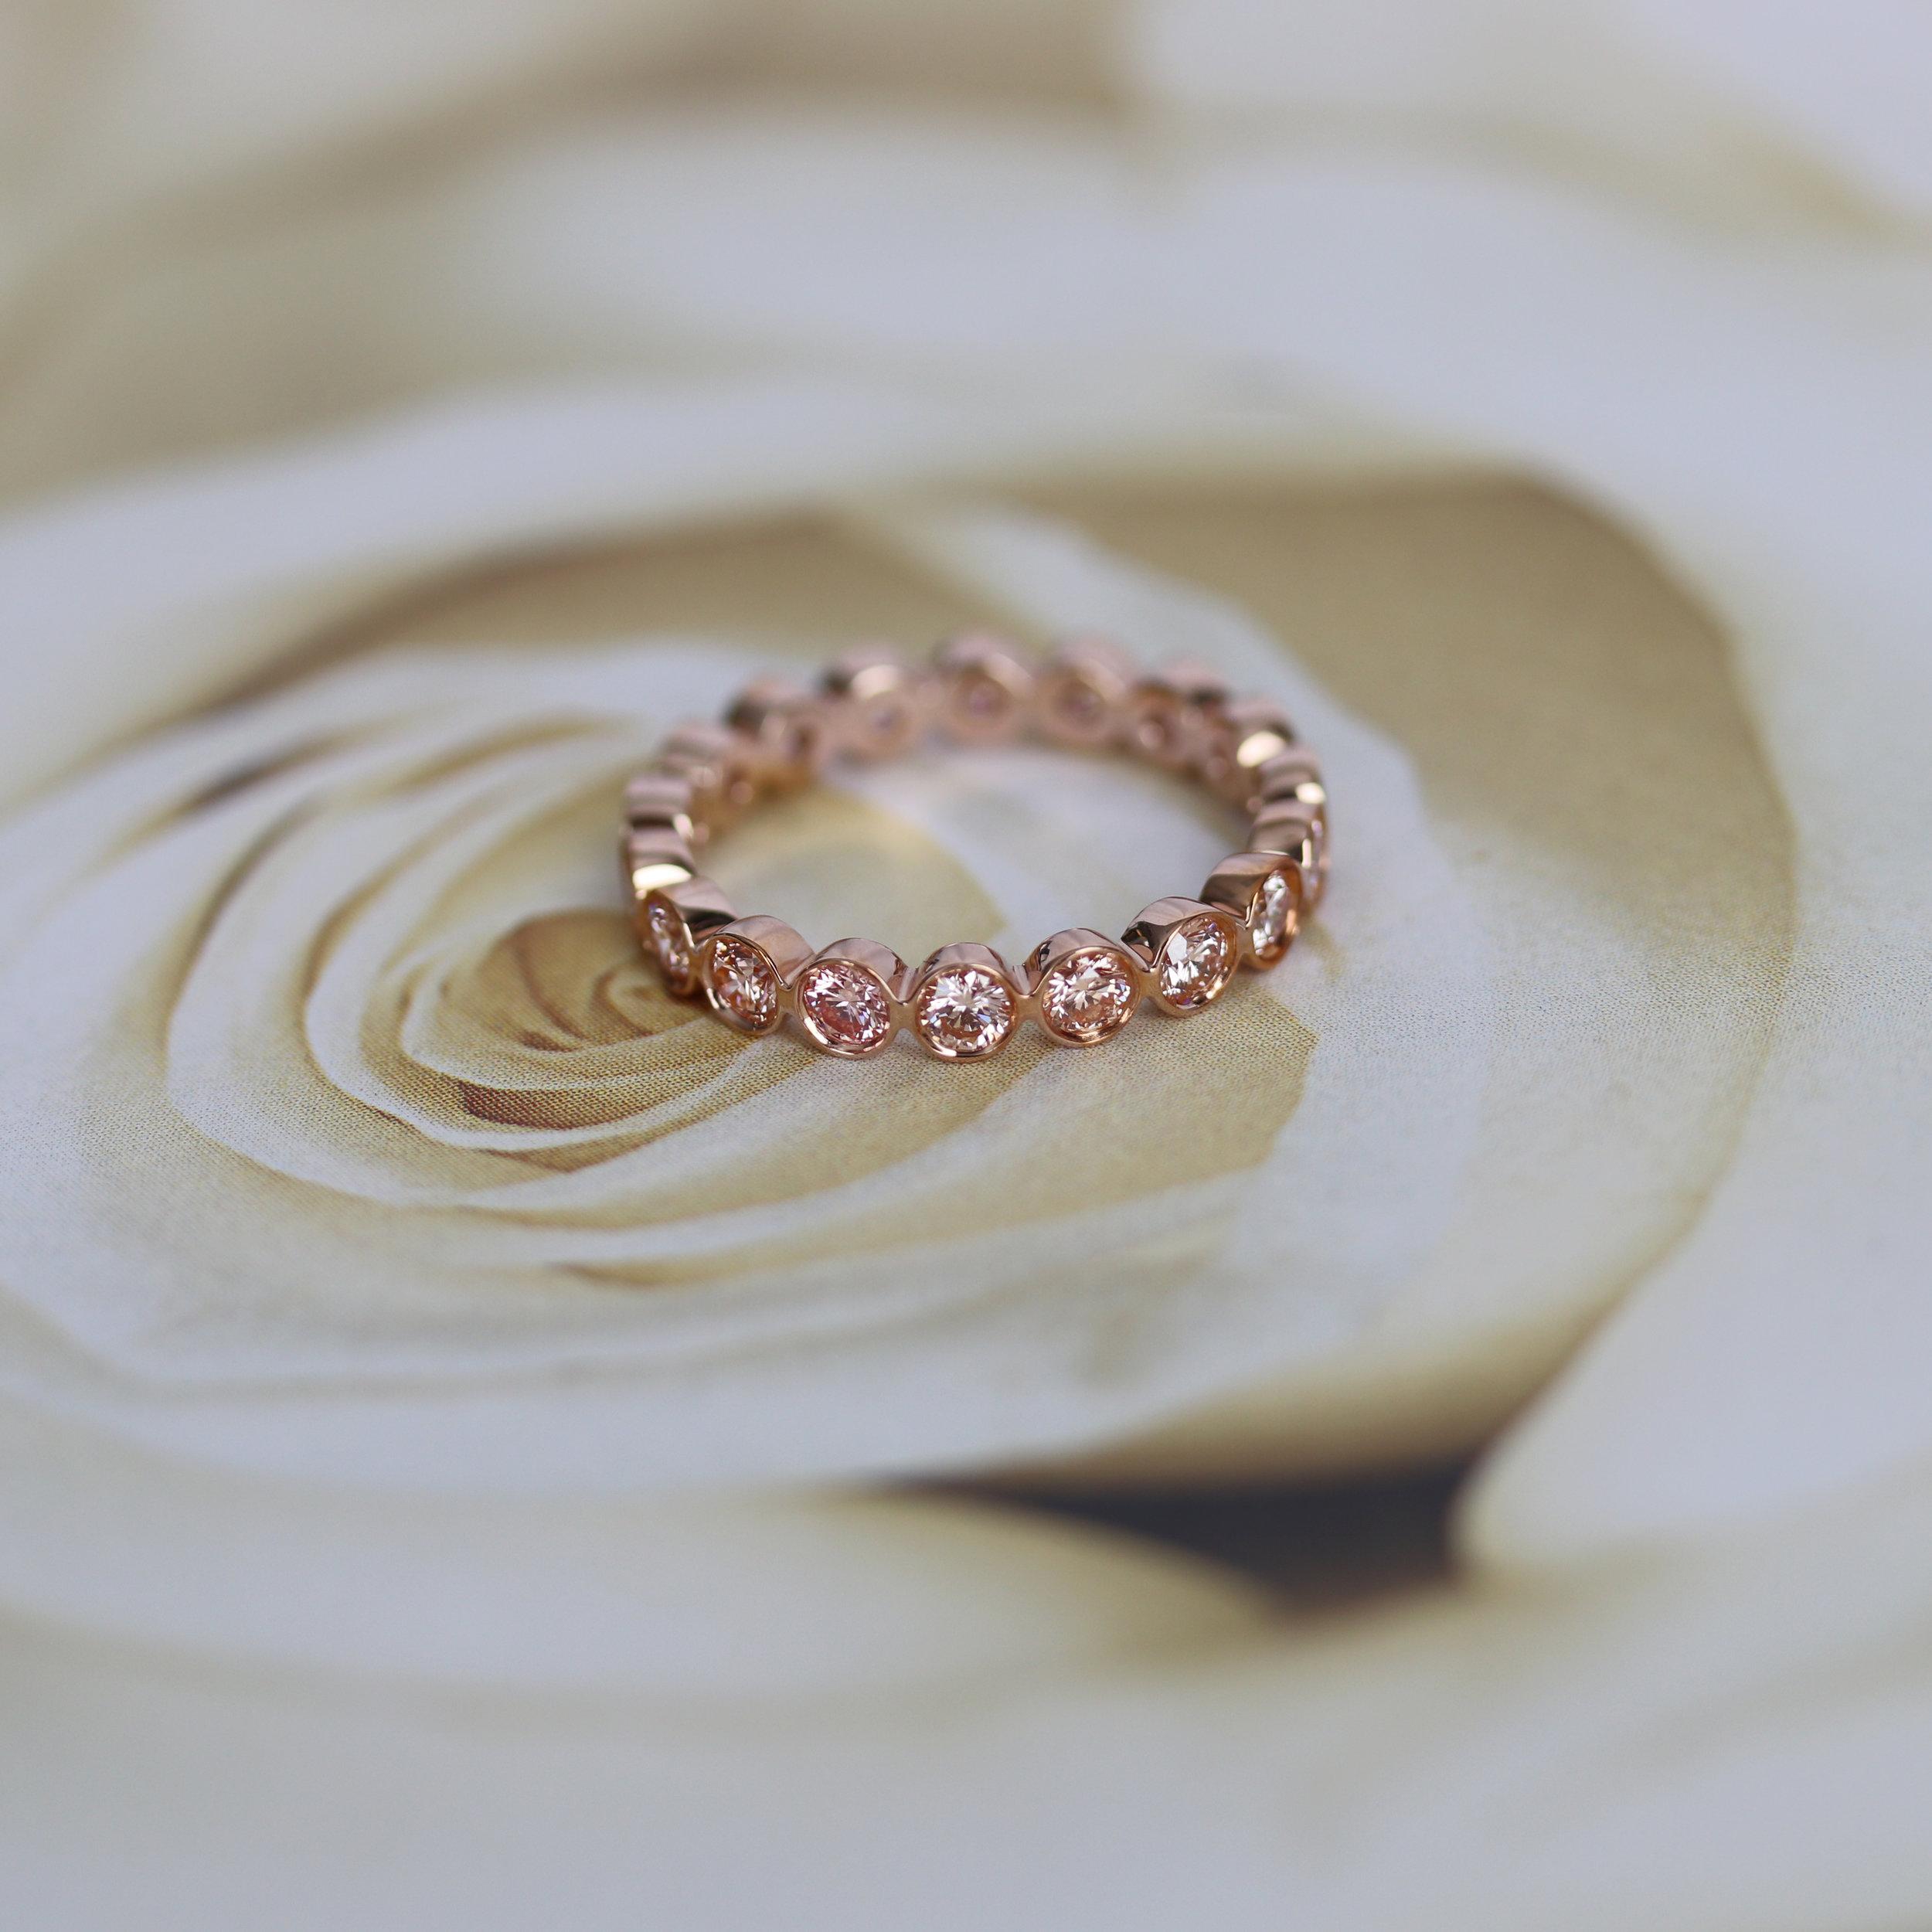 Bezel Set Pink Diamond Eternity Band in Rose Gold